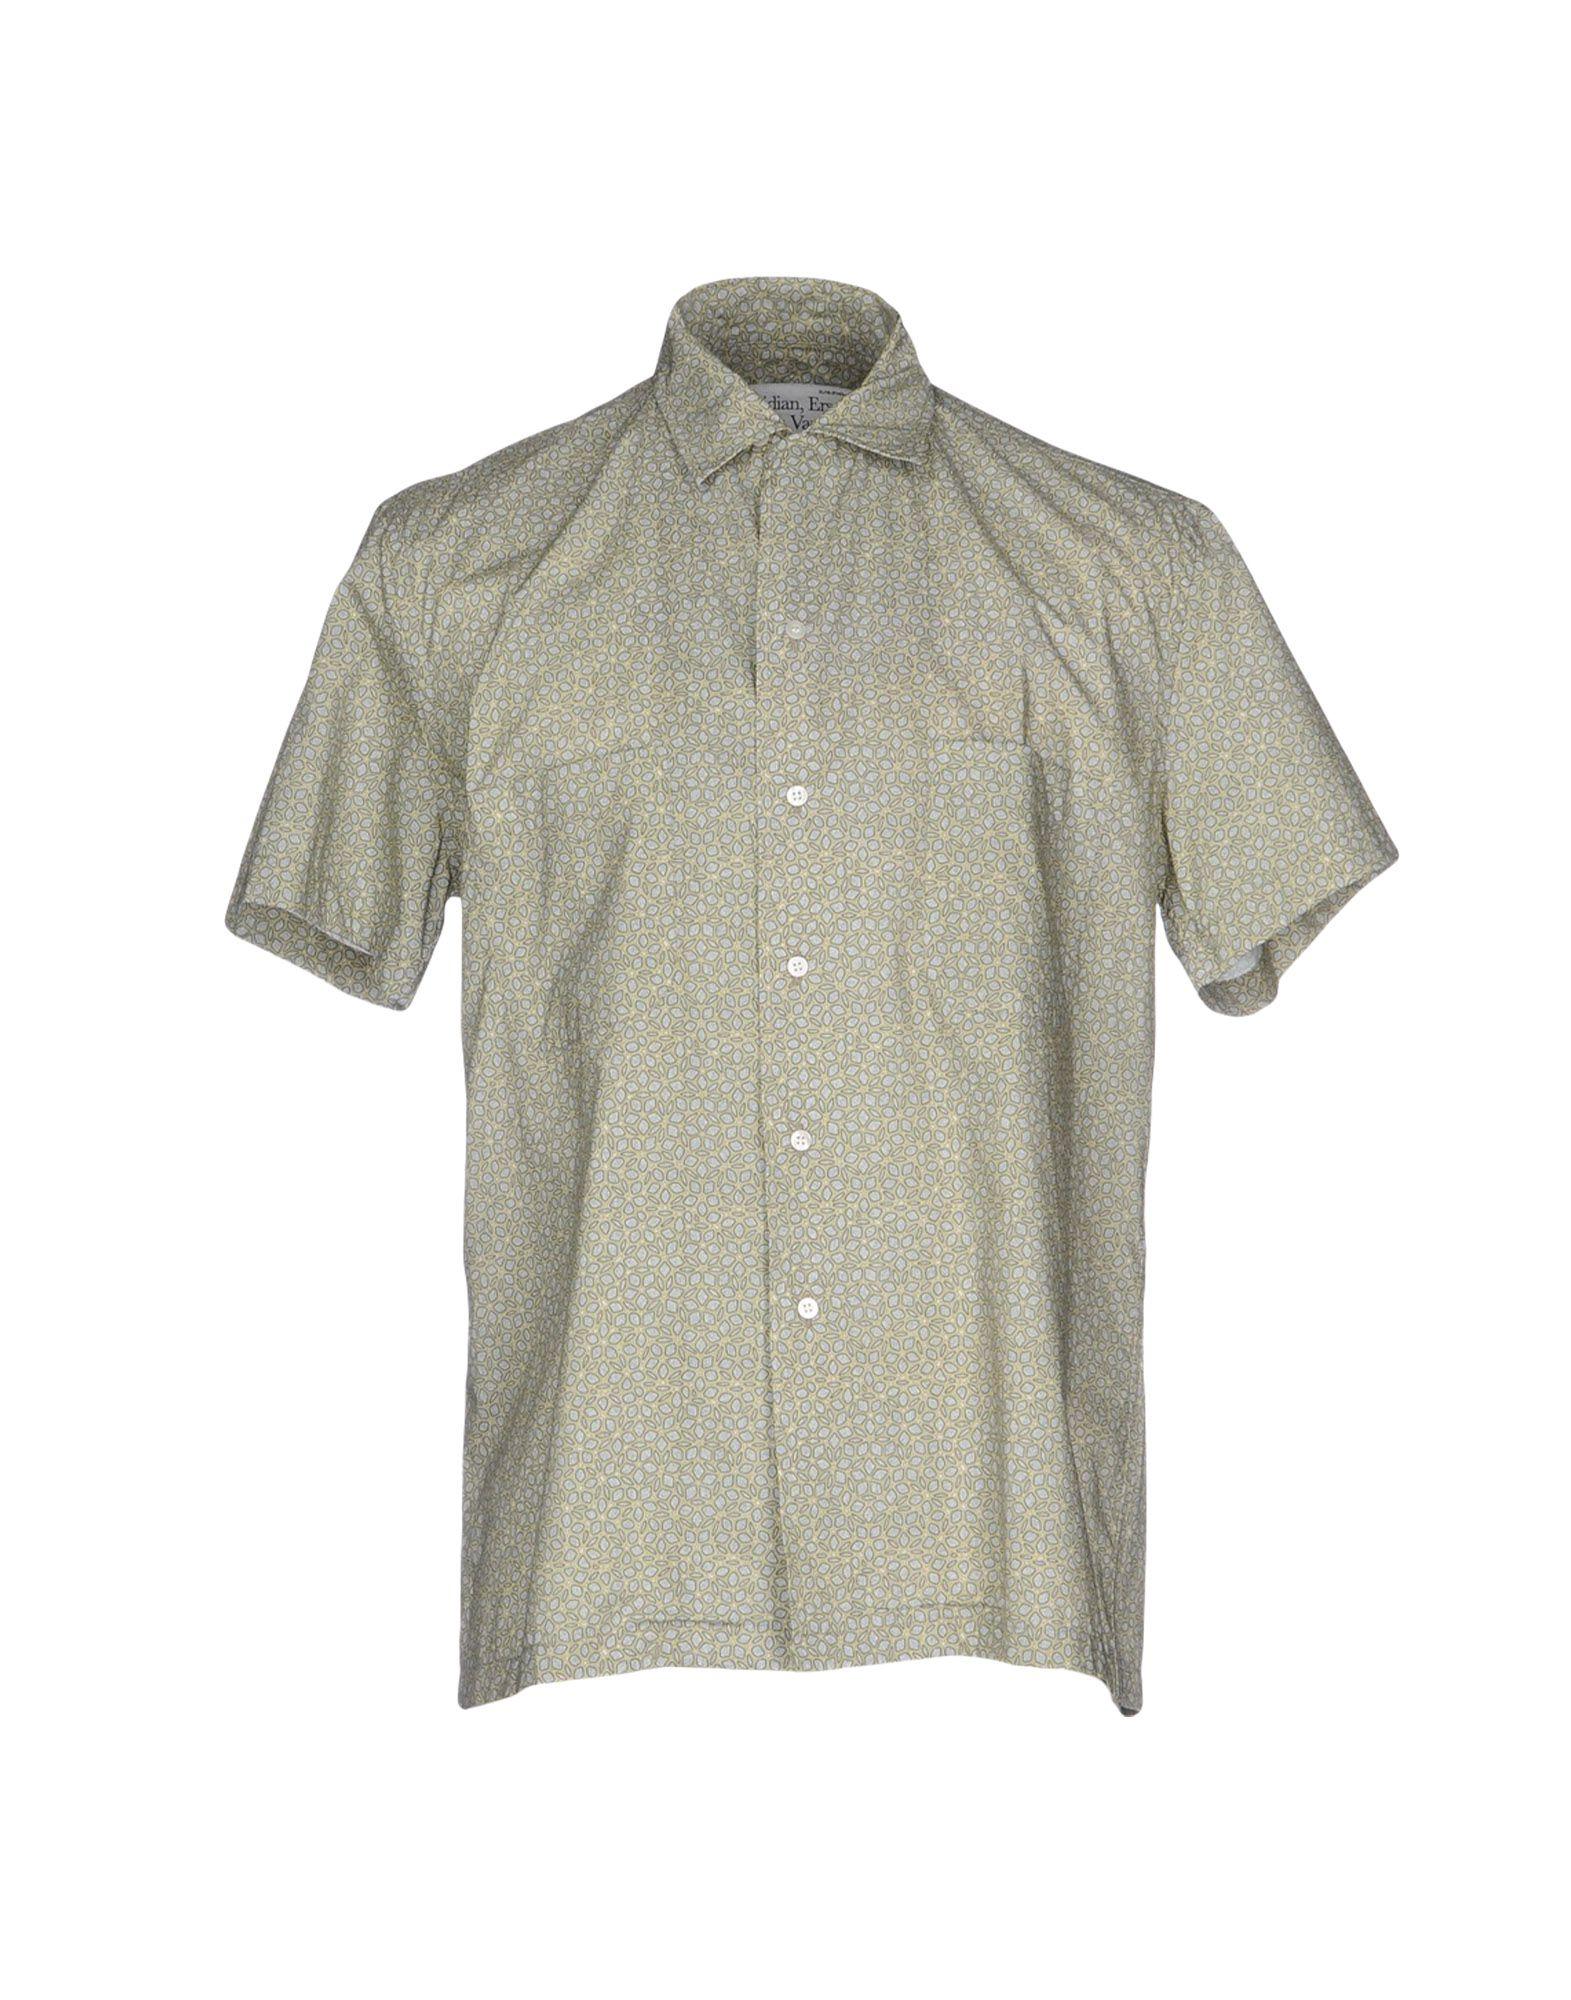 SIDIAN, ERSATZ & VANES Patterned Shirt in Light Green